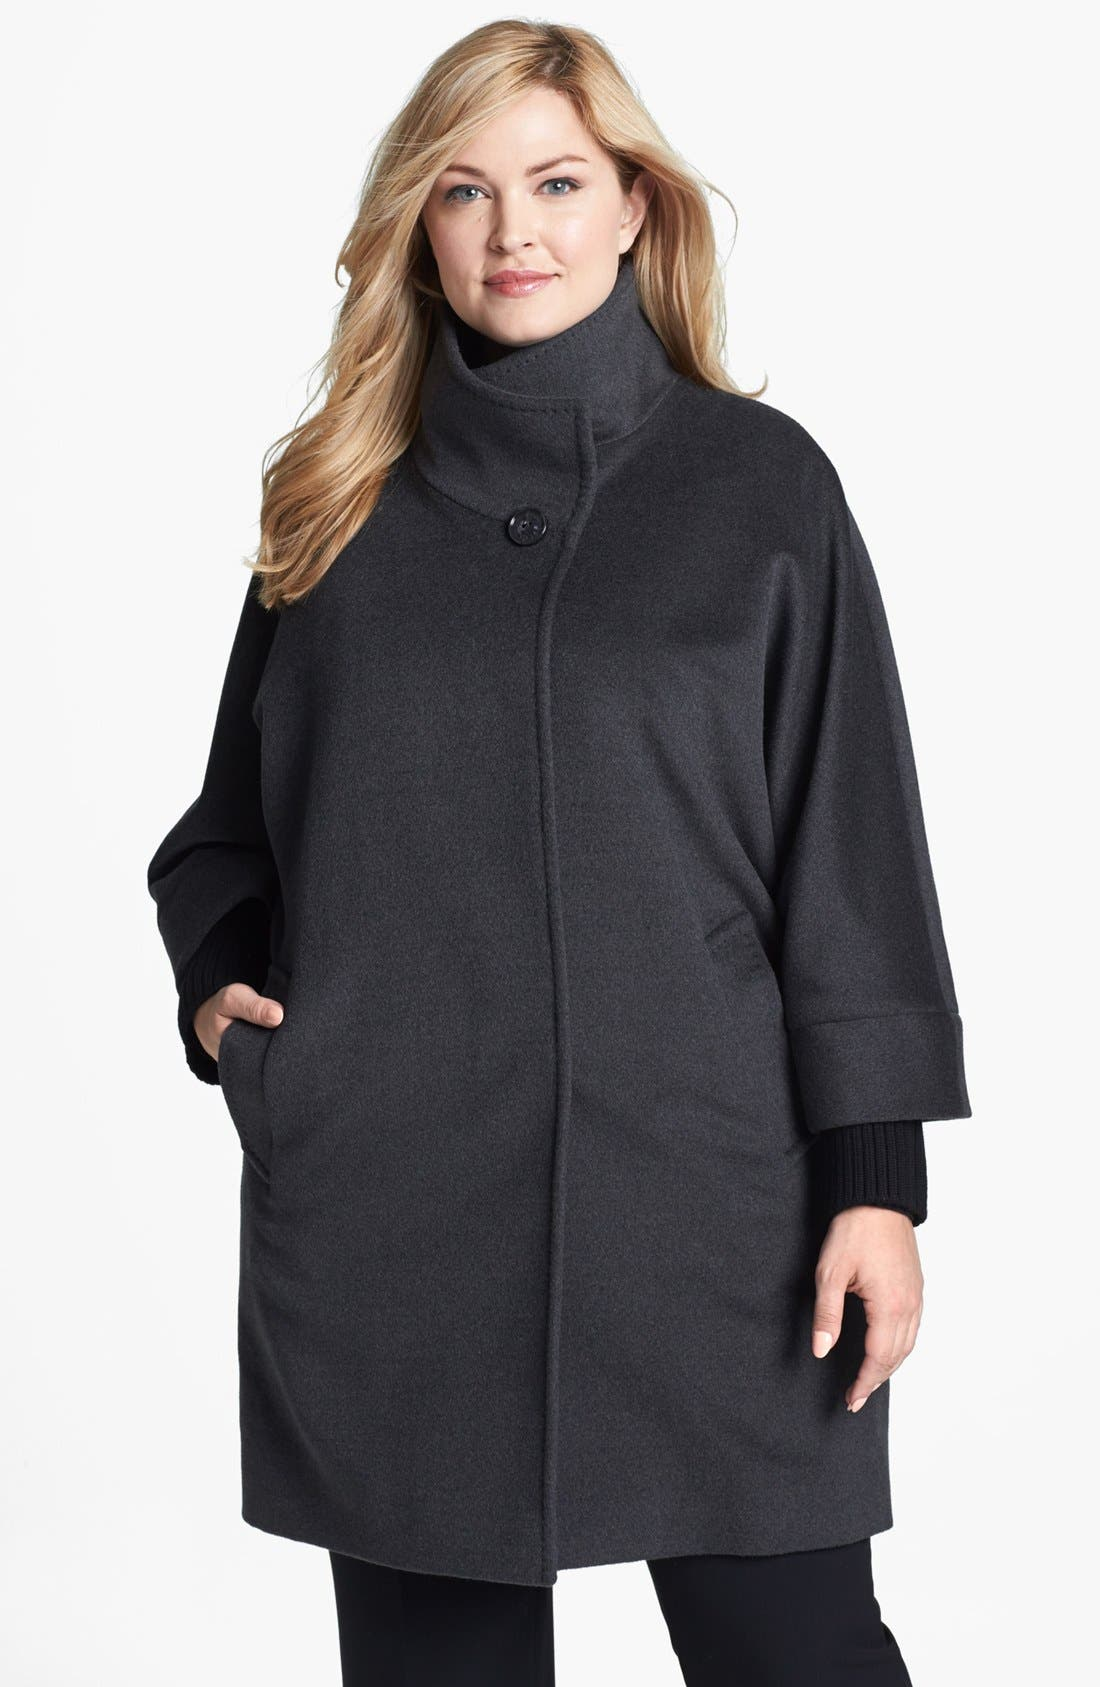 Main Image - Cinzia Rocca Knit Cuff Wool Car Coat (Plus Size)